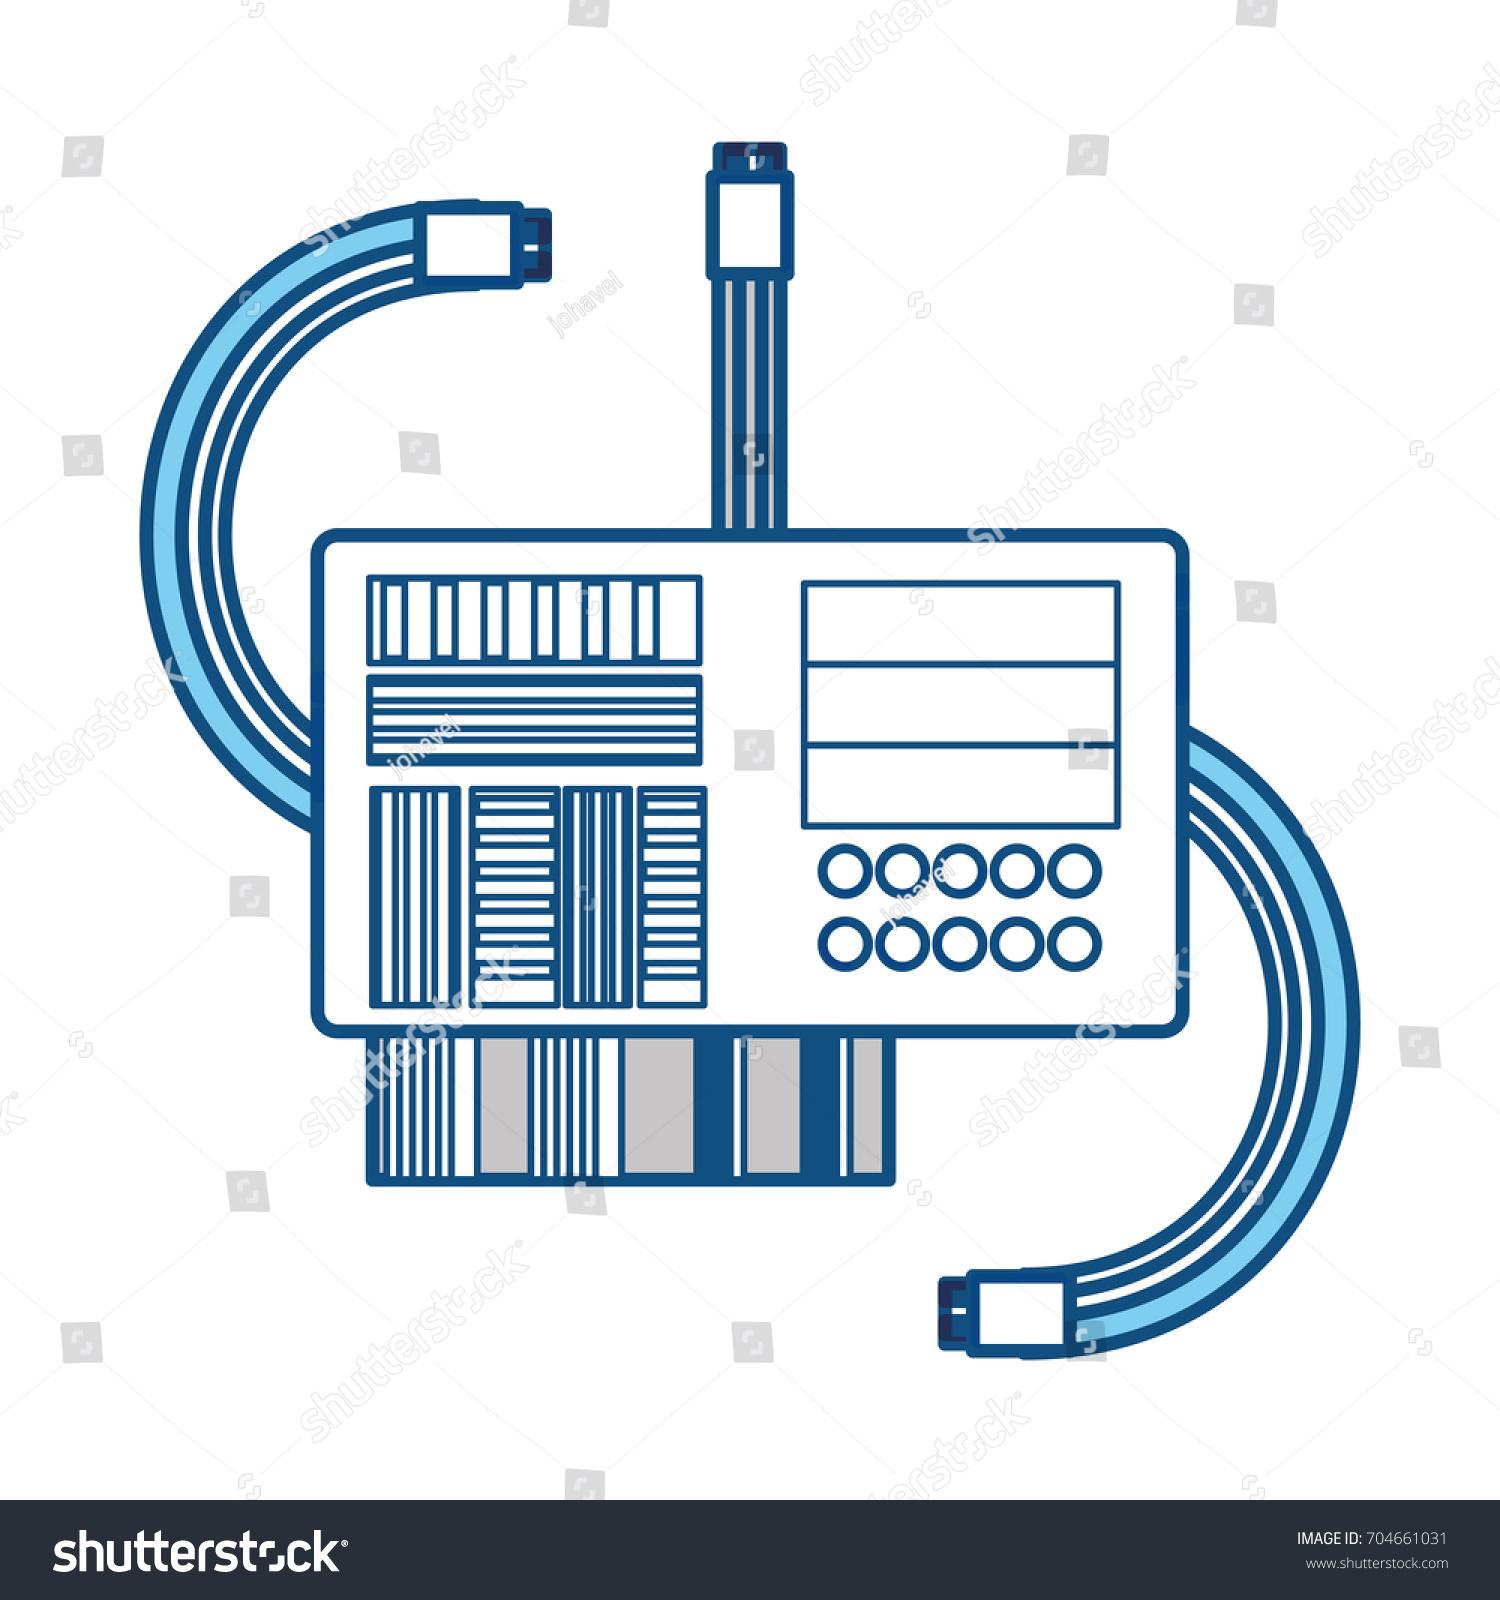 Microchip Integrated Circuit Stock Vector 704661031 - Shutterstock